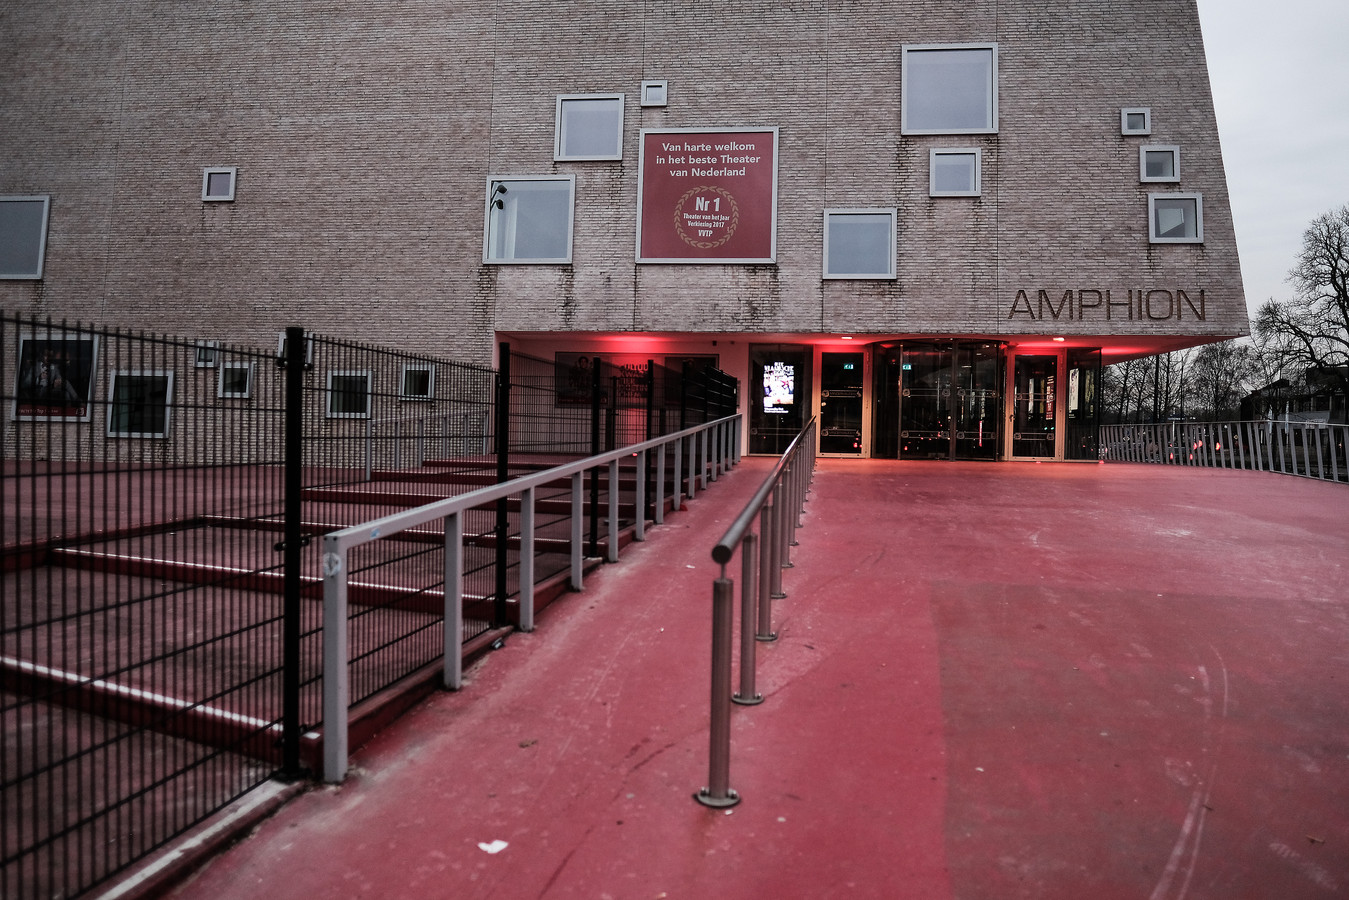 Ingang van schouwburg Amphion in Doetinchem.